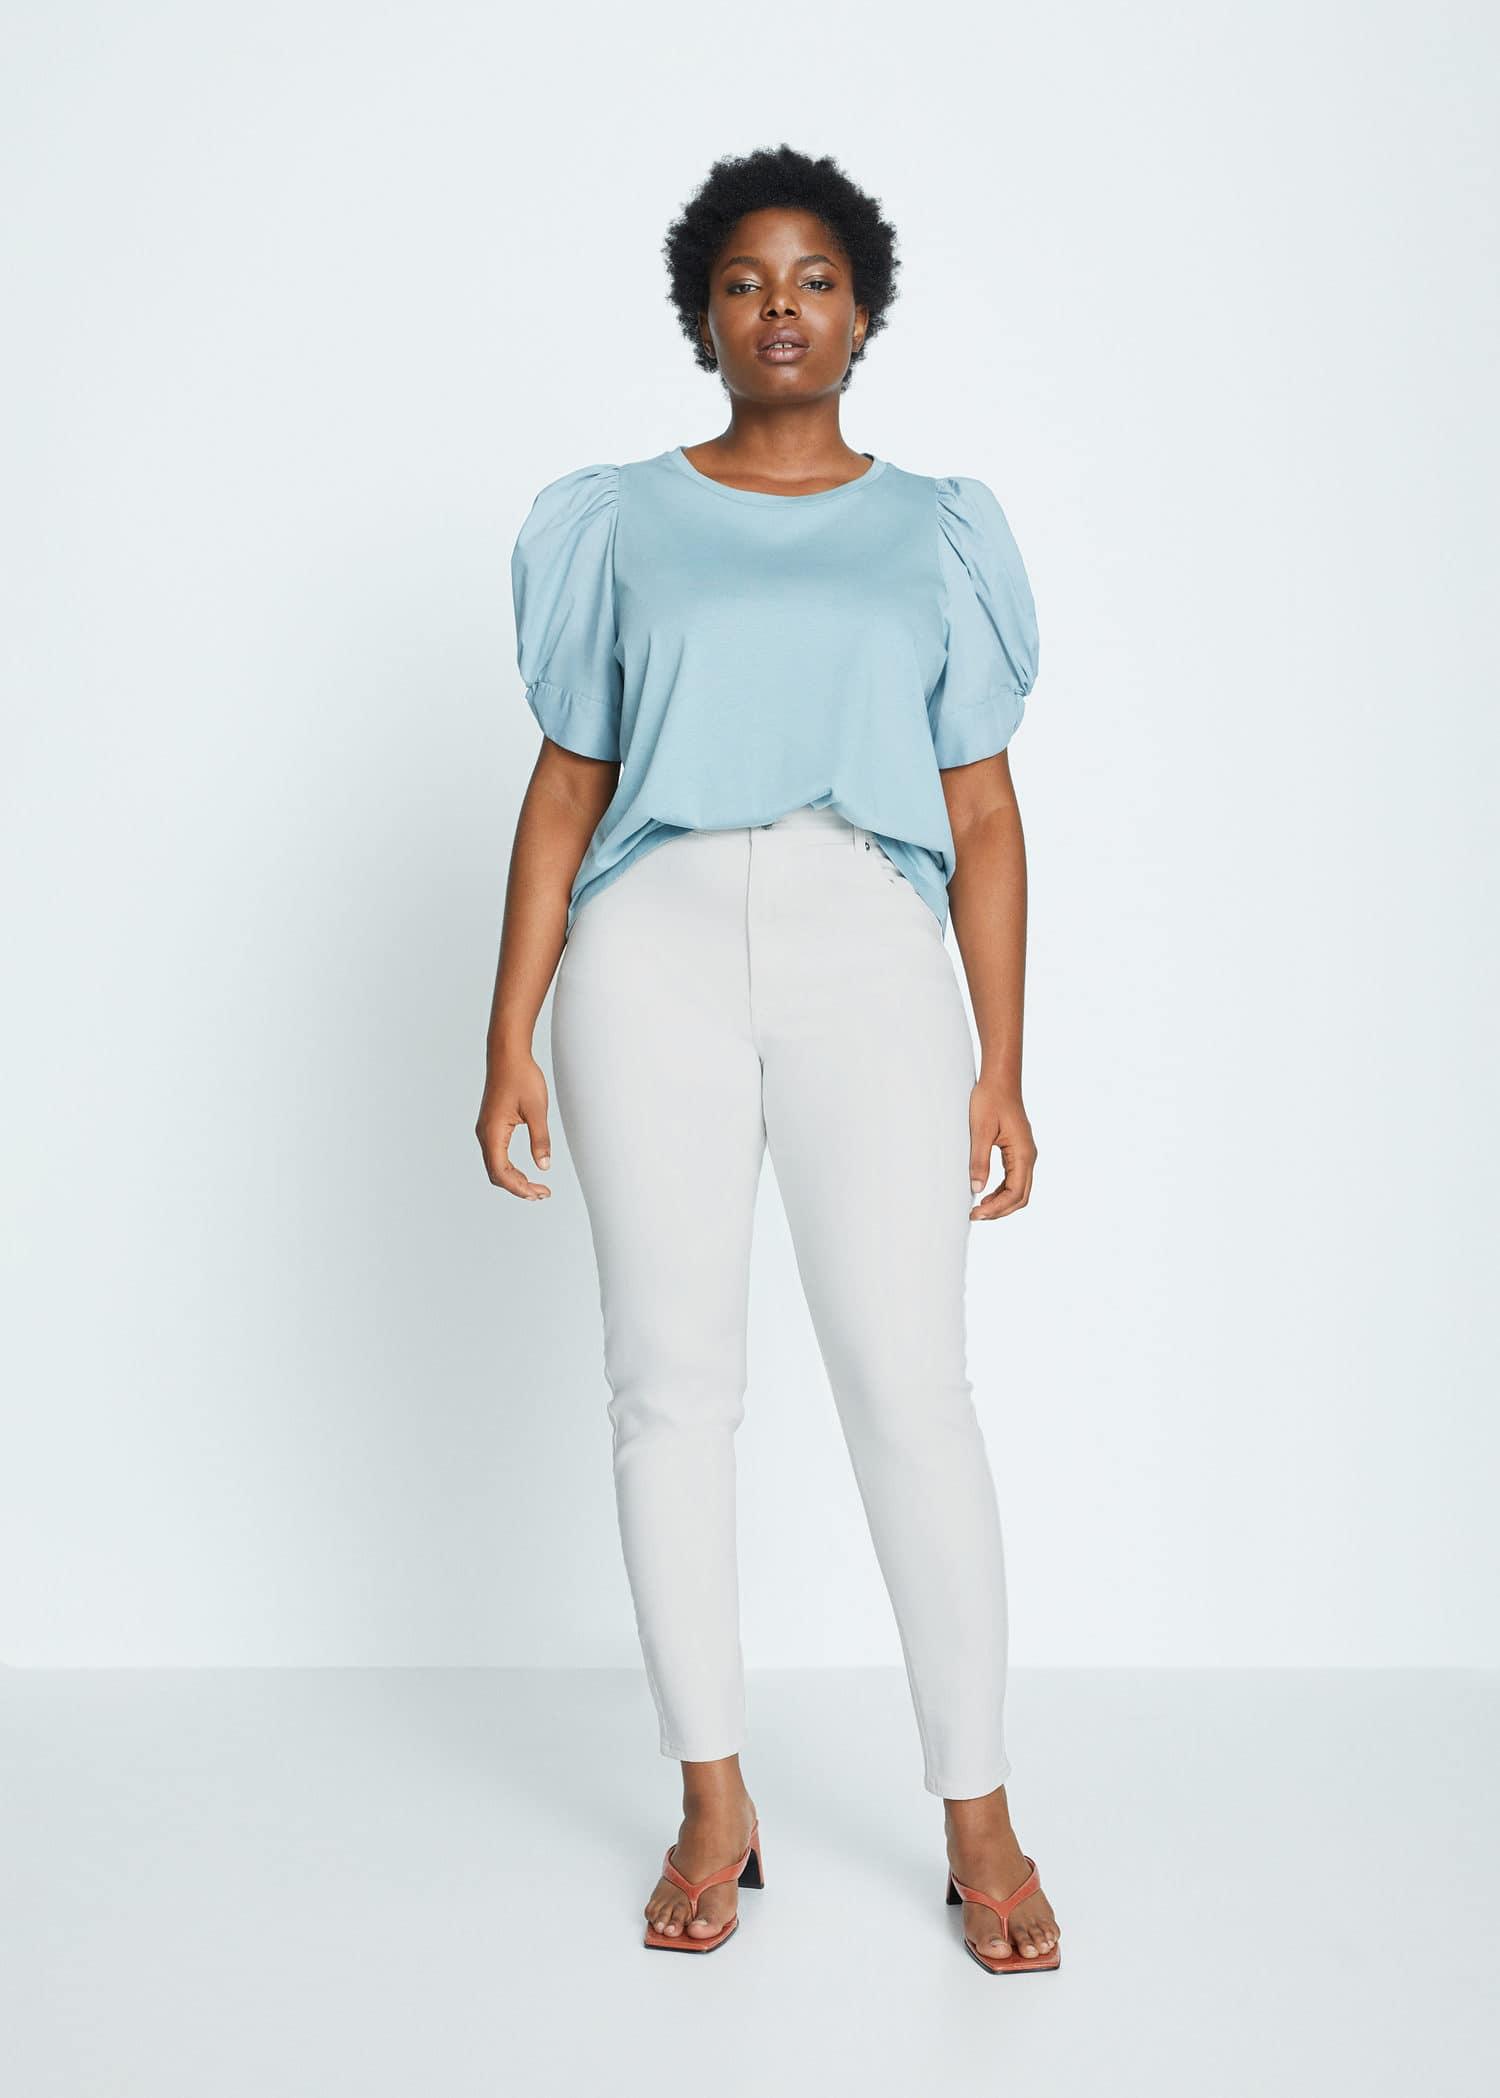 Jeans Super Slim Lorena Tallas Grandes Violeta By Mango Espana